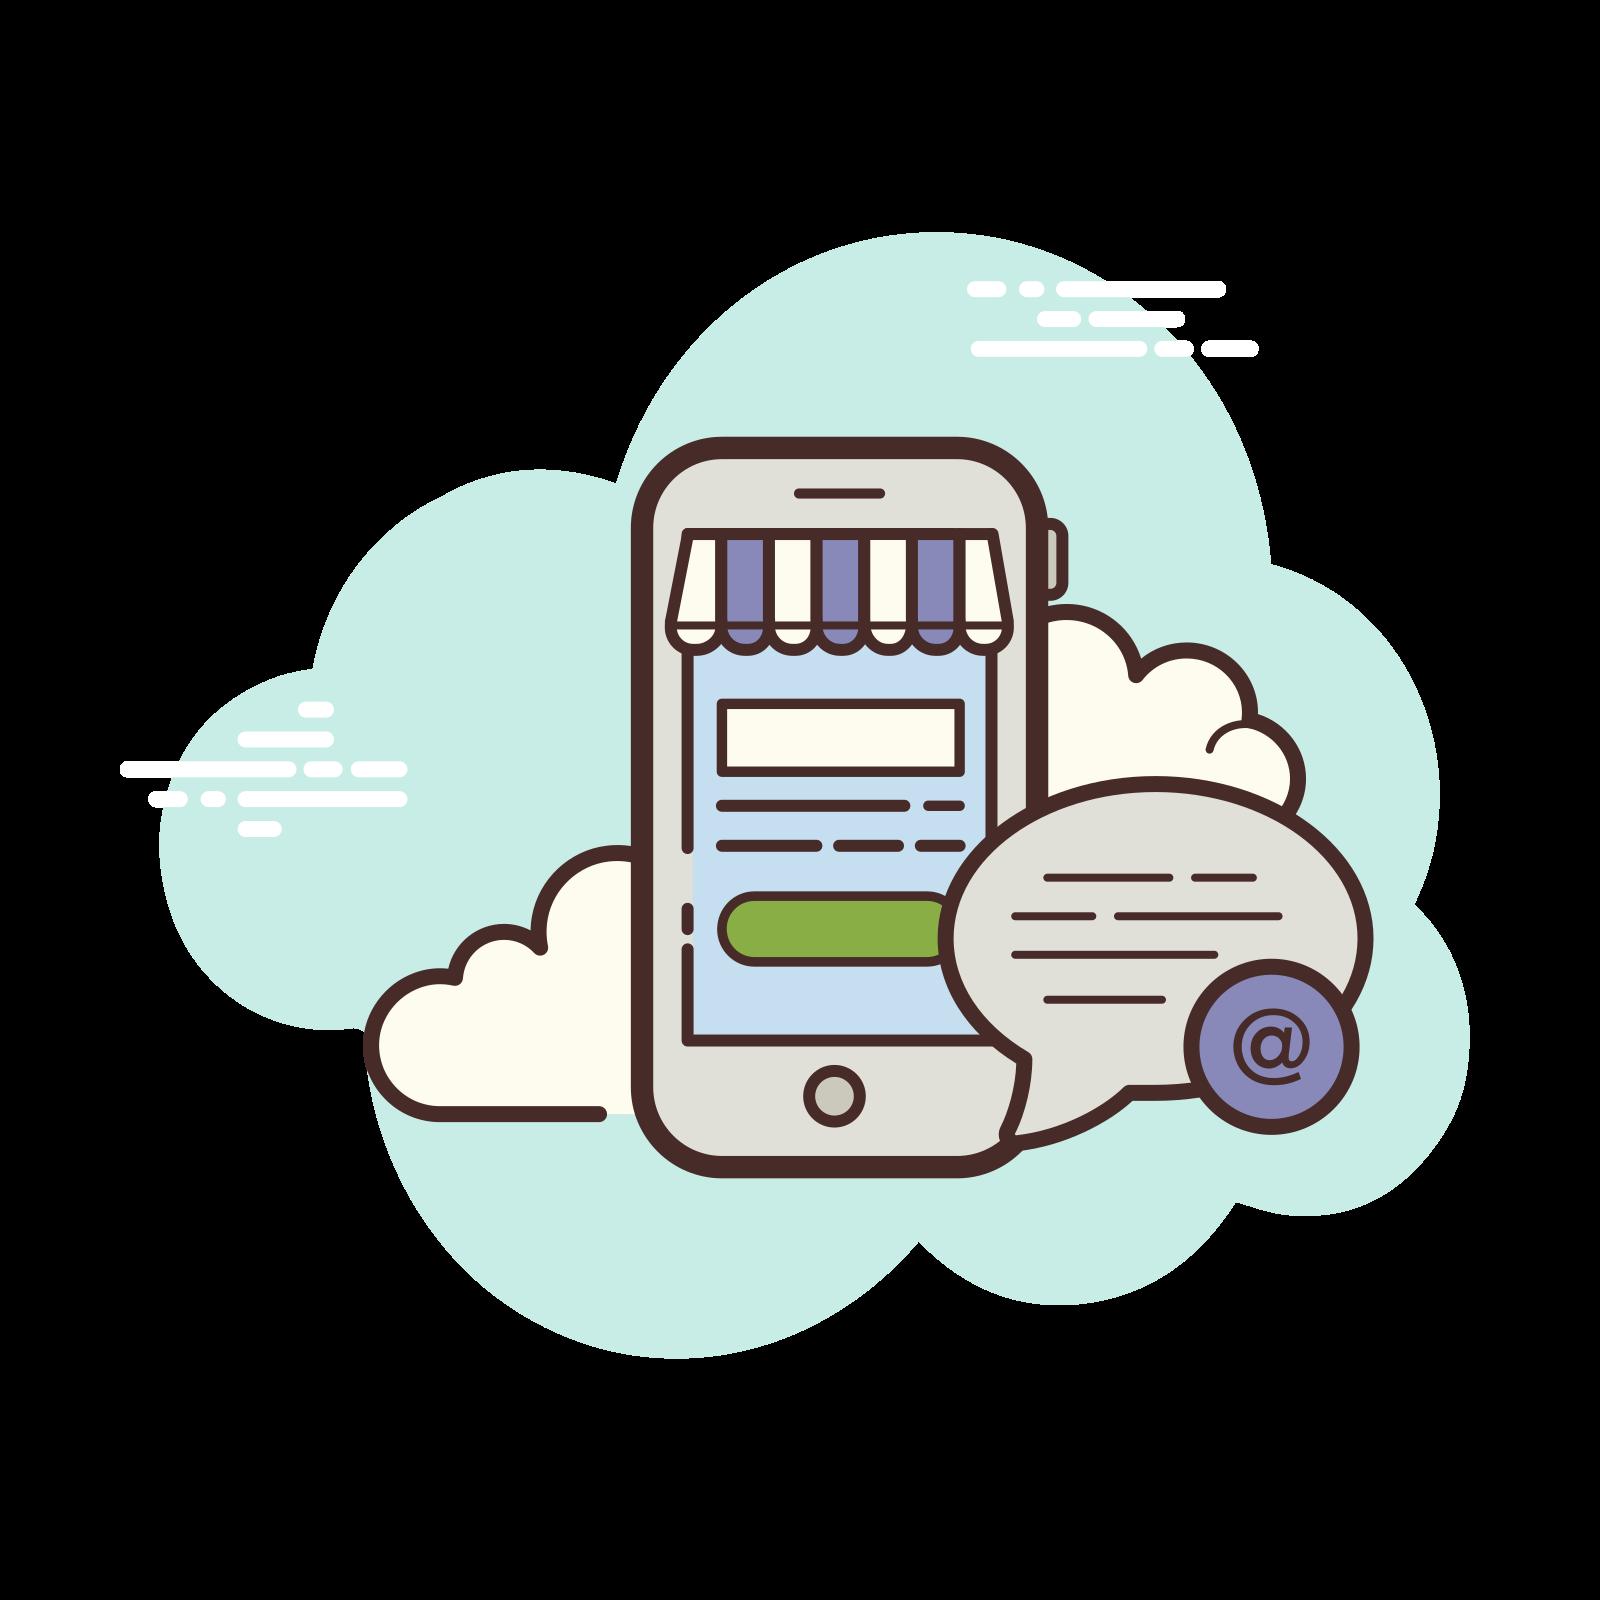 Mobile Shop Addres icon